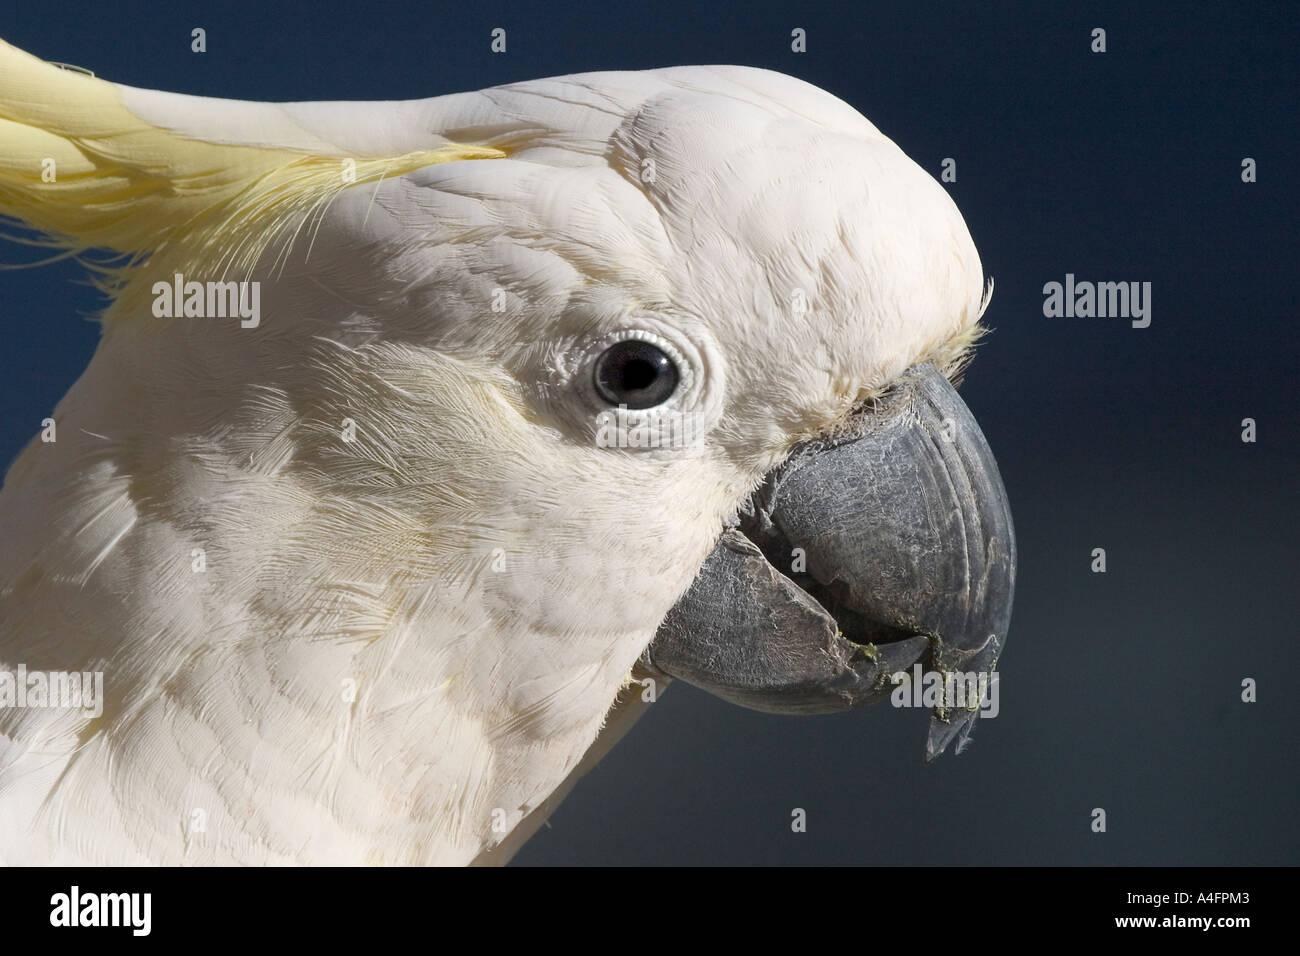 cockatoo portrait - Stock Image